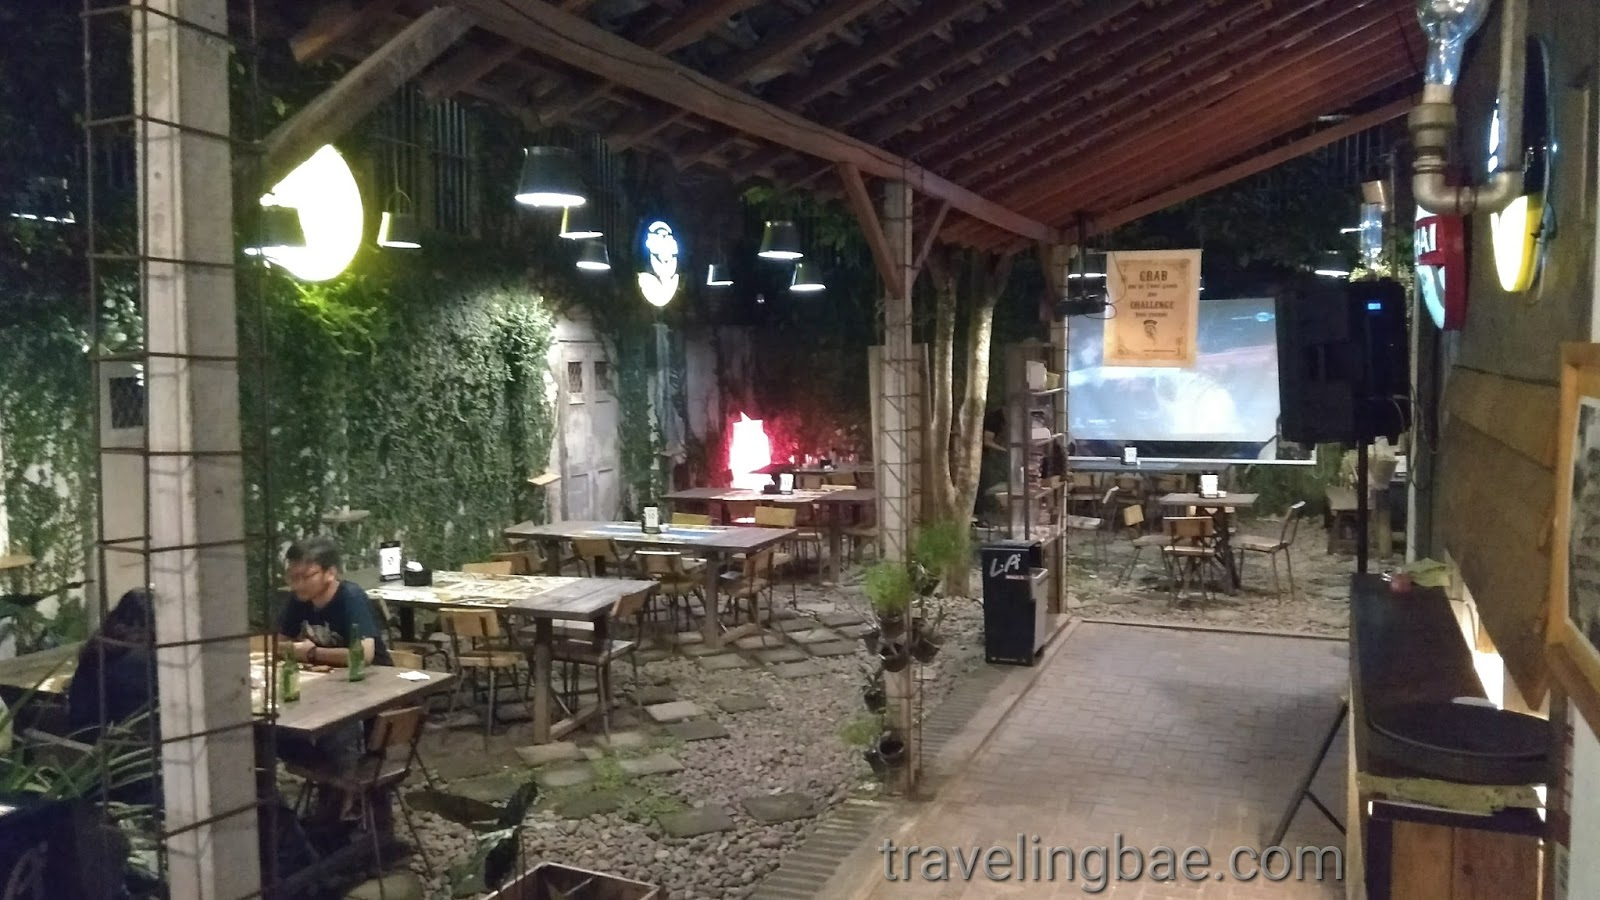 Tap House Beer Garden Tempat Ngebir Seru Dekat Malioboro Your Traveling Bae